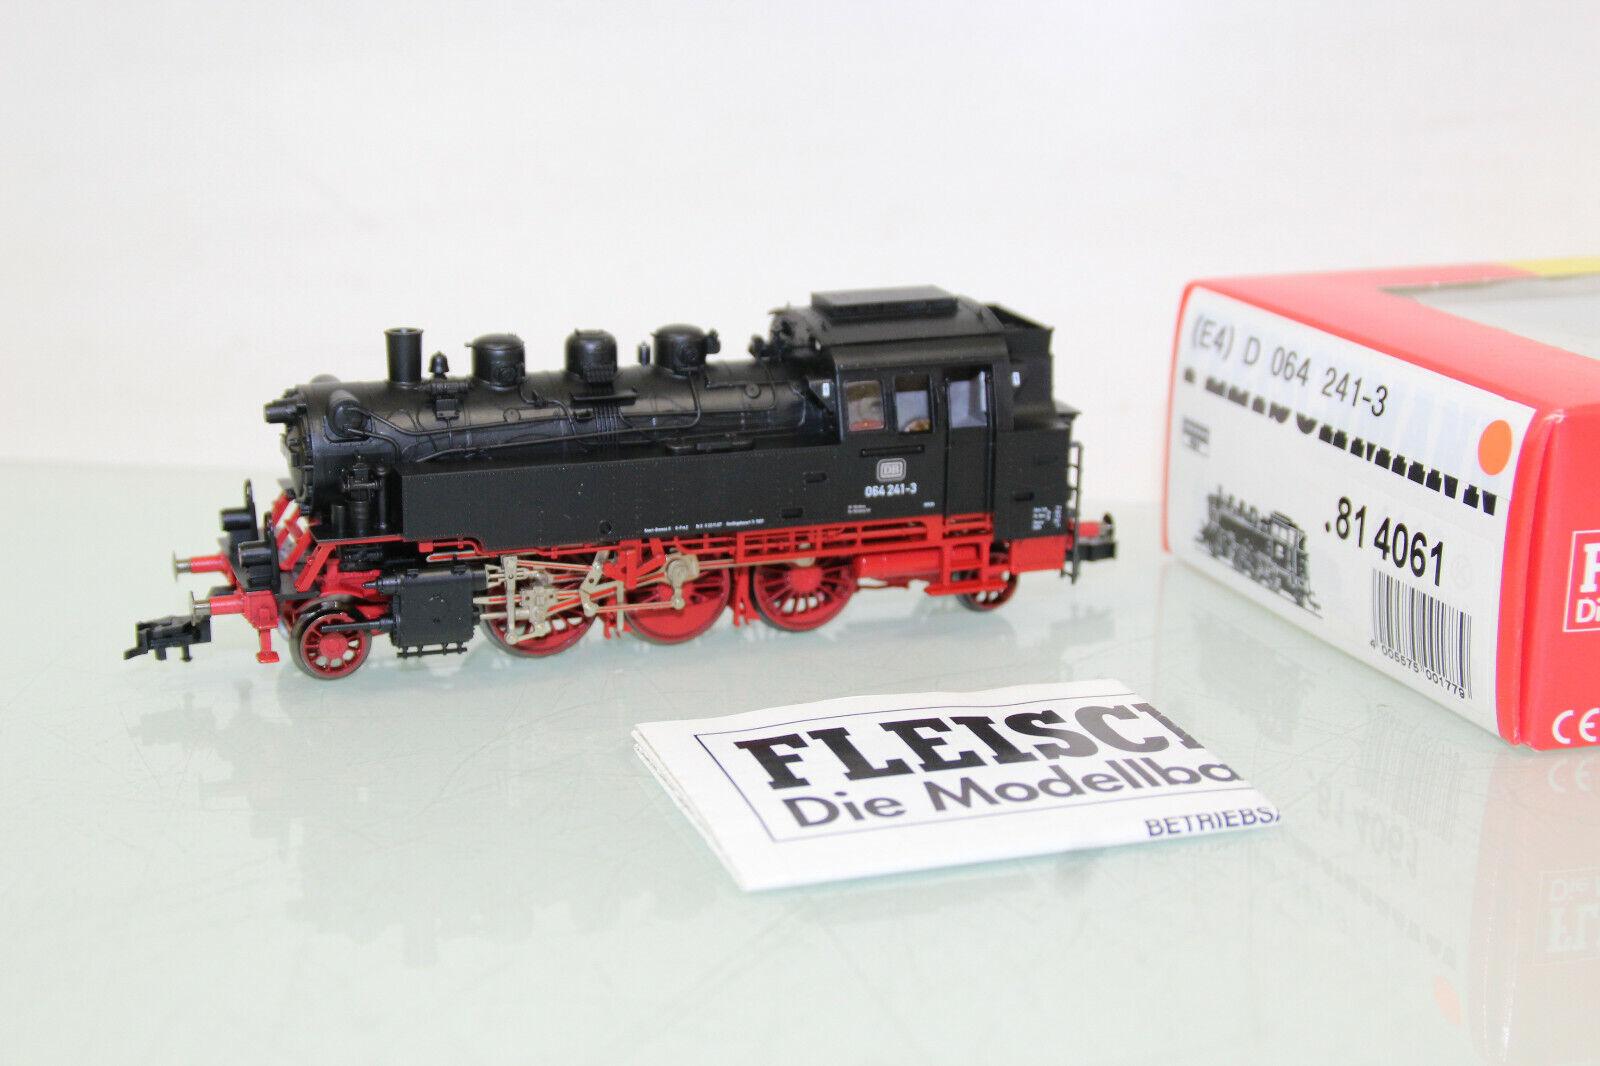 Fleischmann H0 81 4061 vapor locomotora BR 064 241-3 DB DSS + menta + caja original (CL2864)